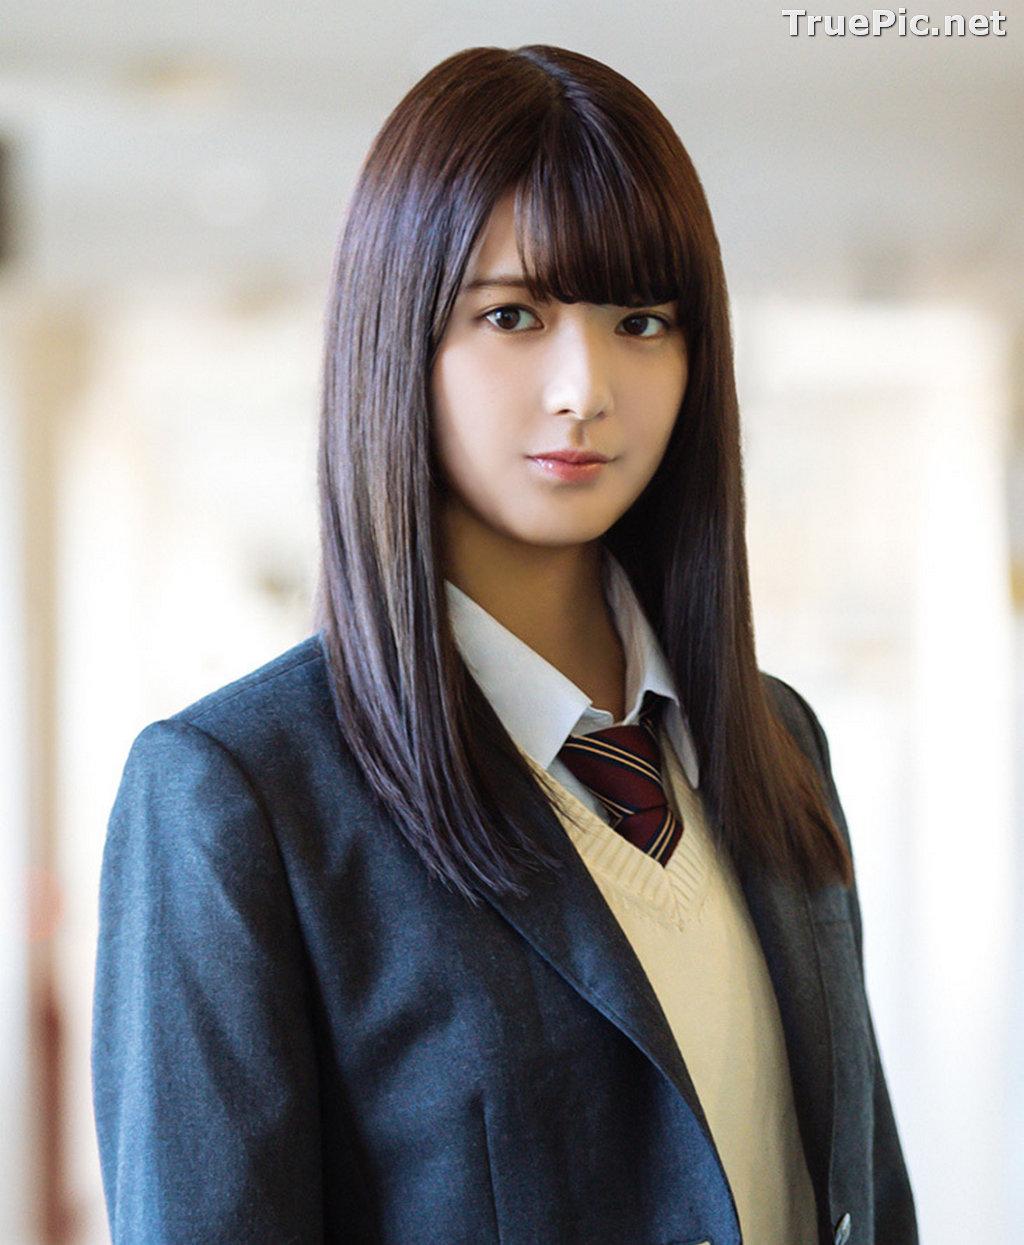 Image Japanese Idol Singer - Yumiko Seki (関有美子) - Beautiful Picture Collection 2020 - TruePic.net - Picture-1